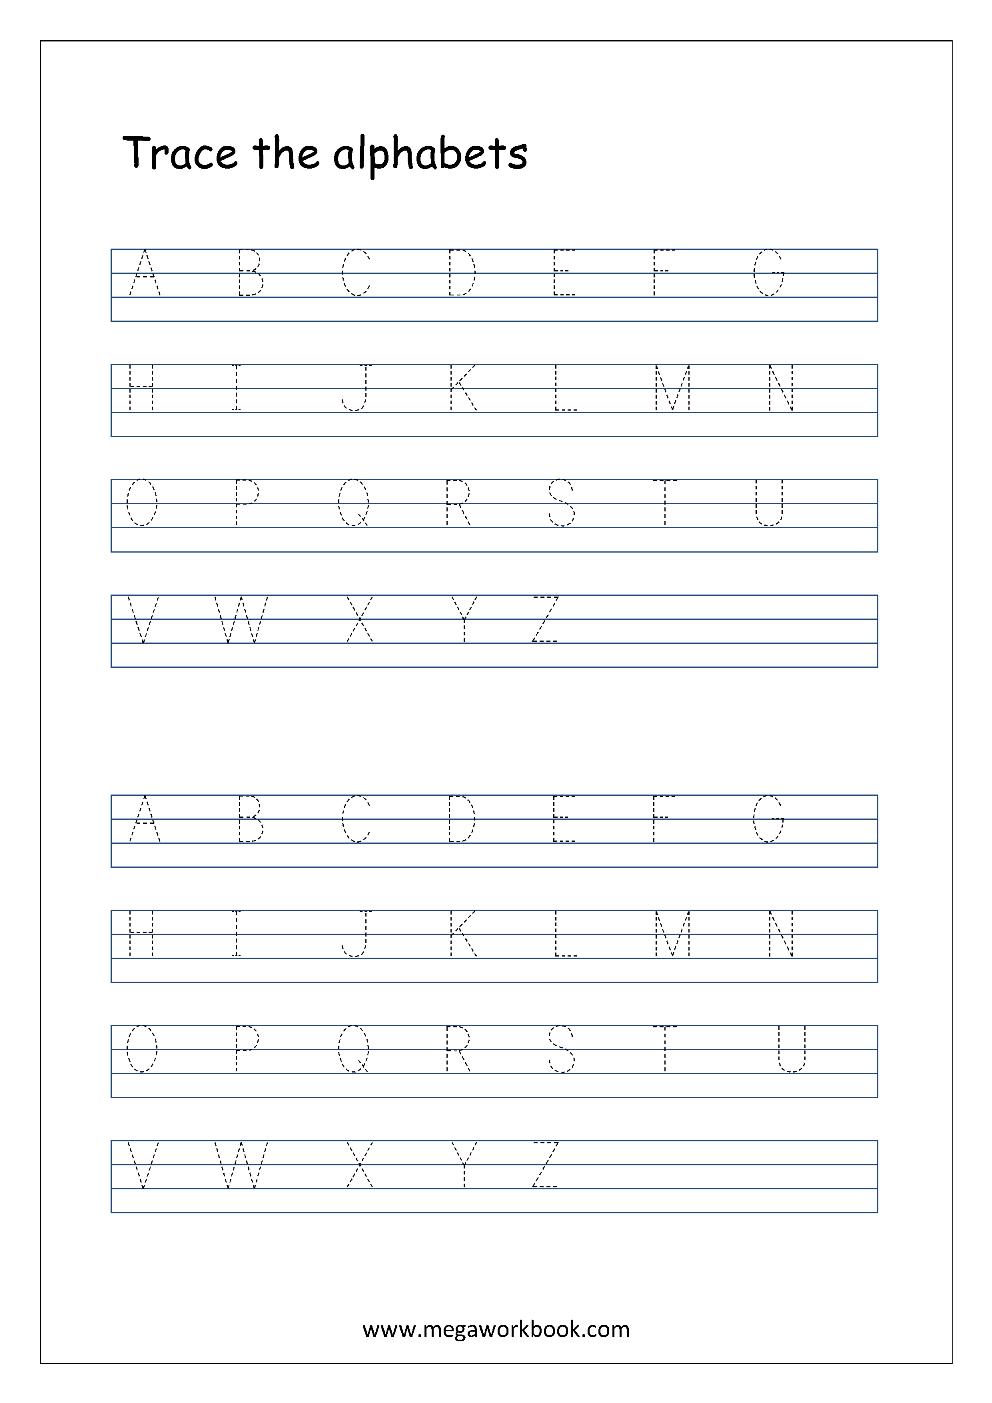 English Worksheet Alphabet Tracing In 4 Lines Capital Letters Tracing A Alphabet Tracing Worksheets Alphabet Practice Worksheets Alphabet Writing Practice [ 1403 x 992 Pixel ]